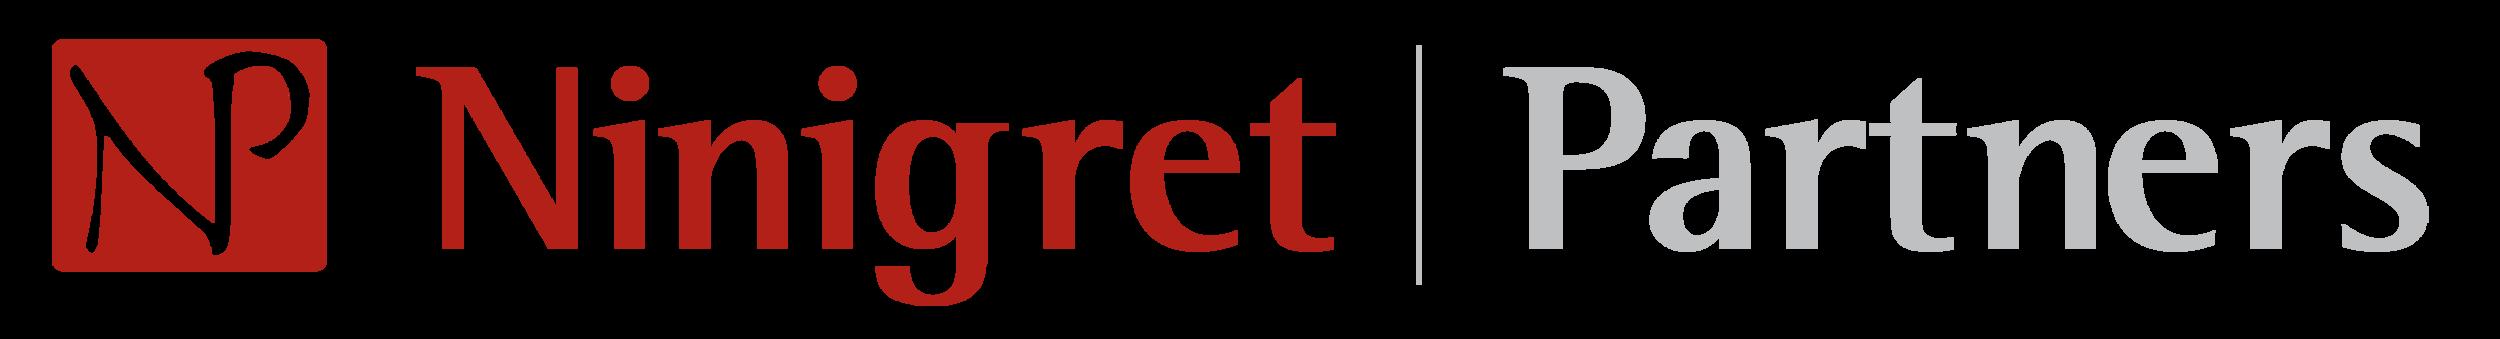 Web_Ninigret_Partners_Logo.png